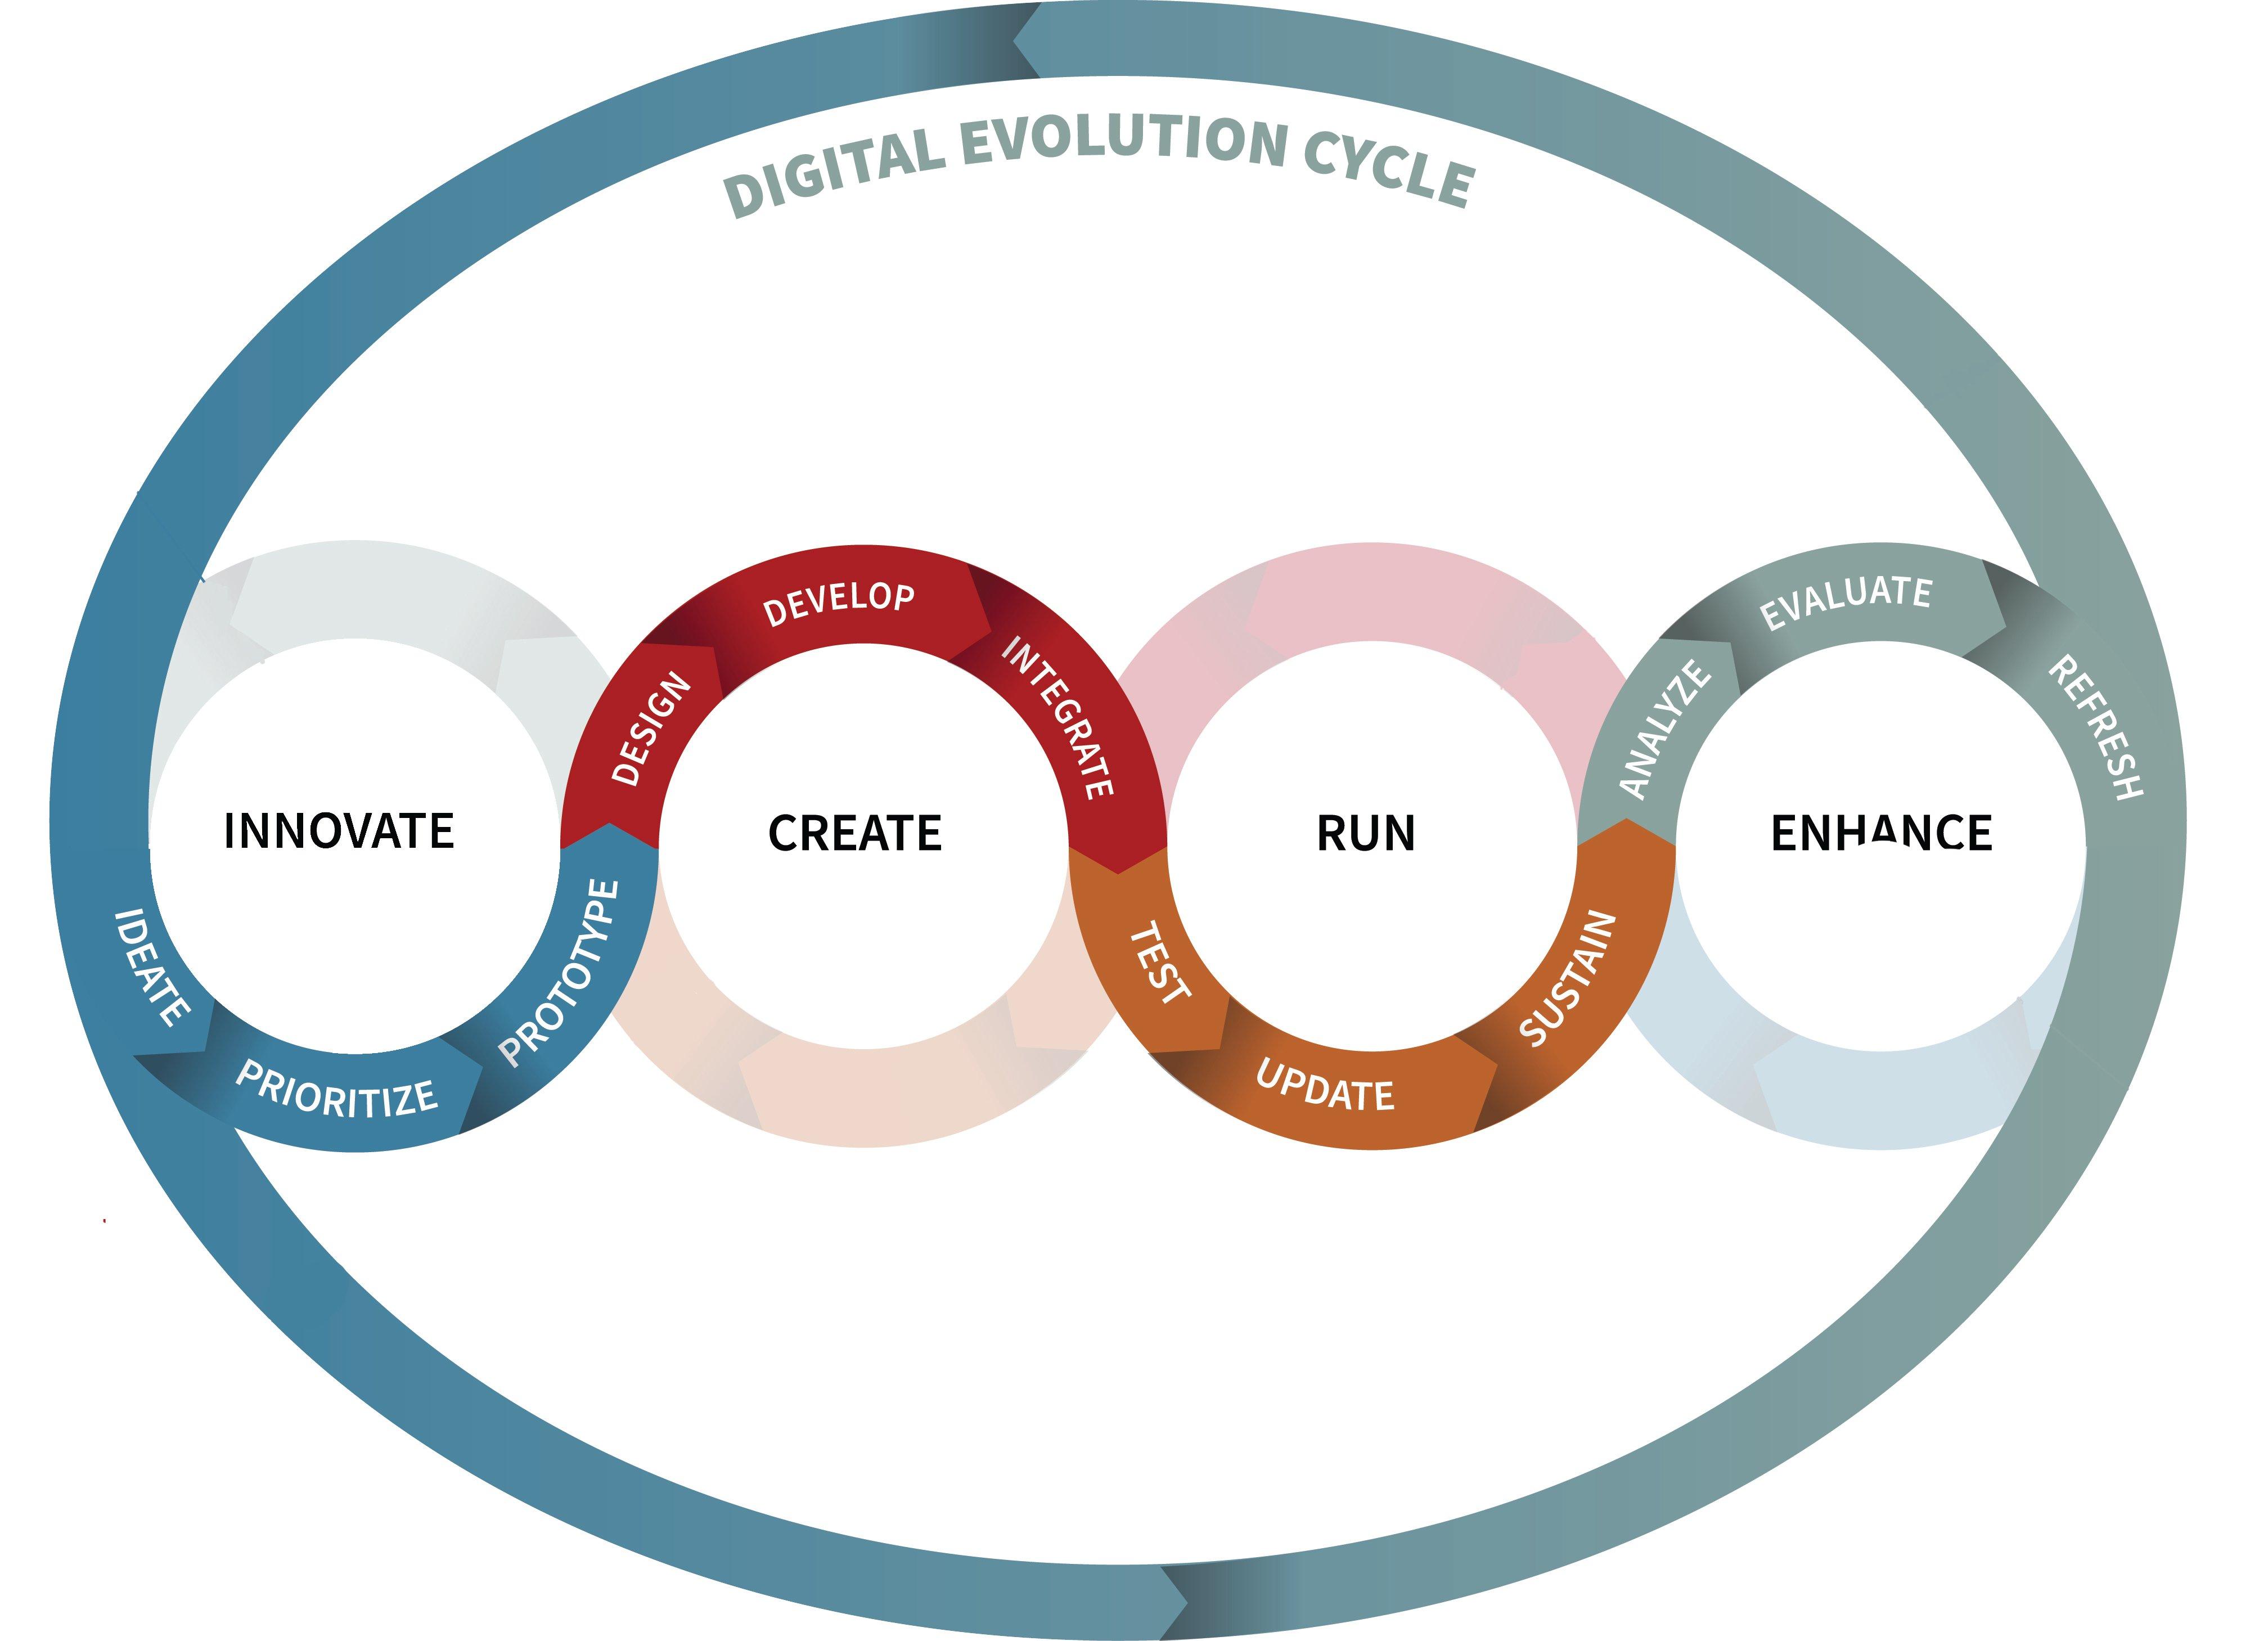 digital-evolution-cycle-mobile